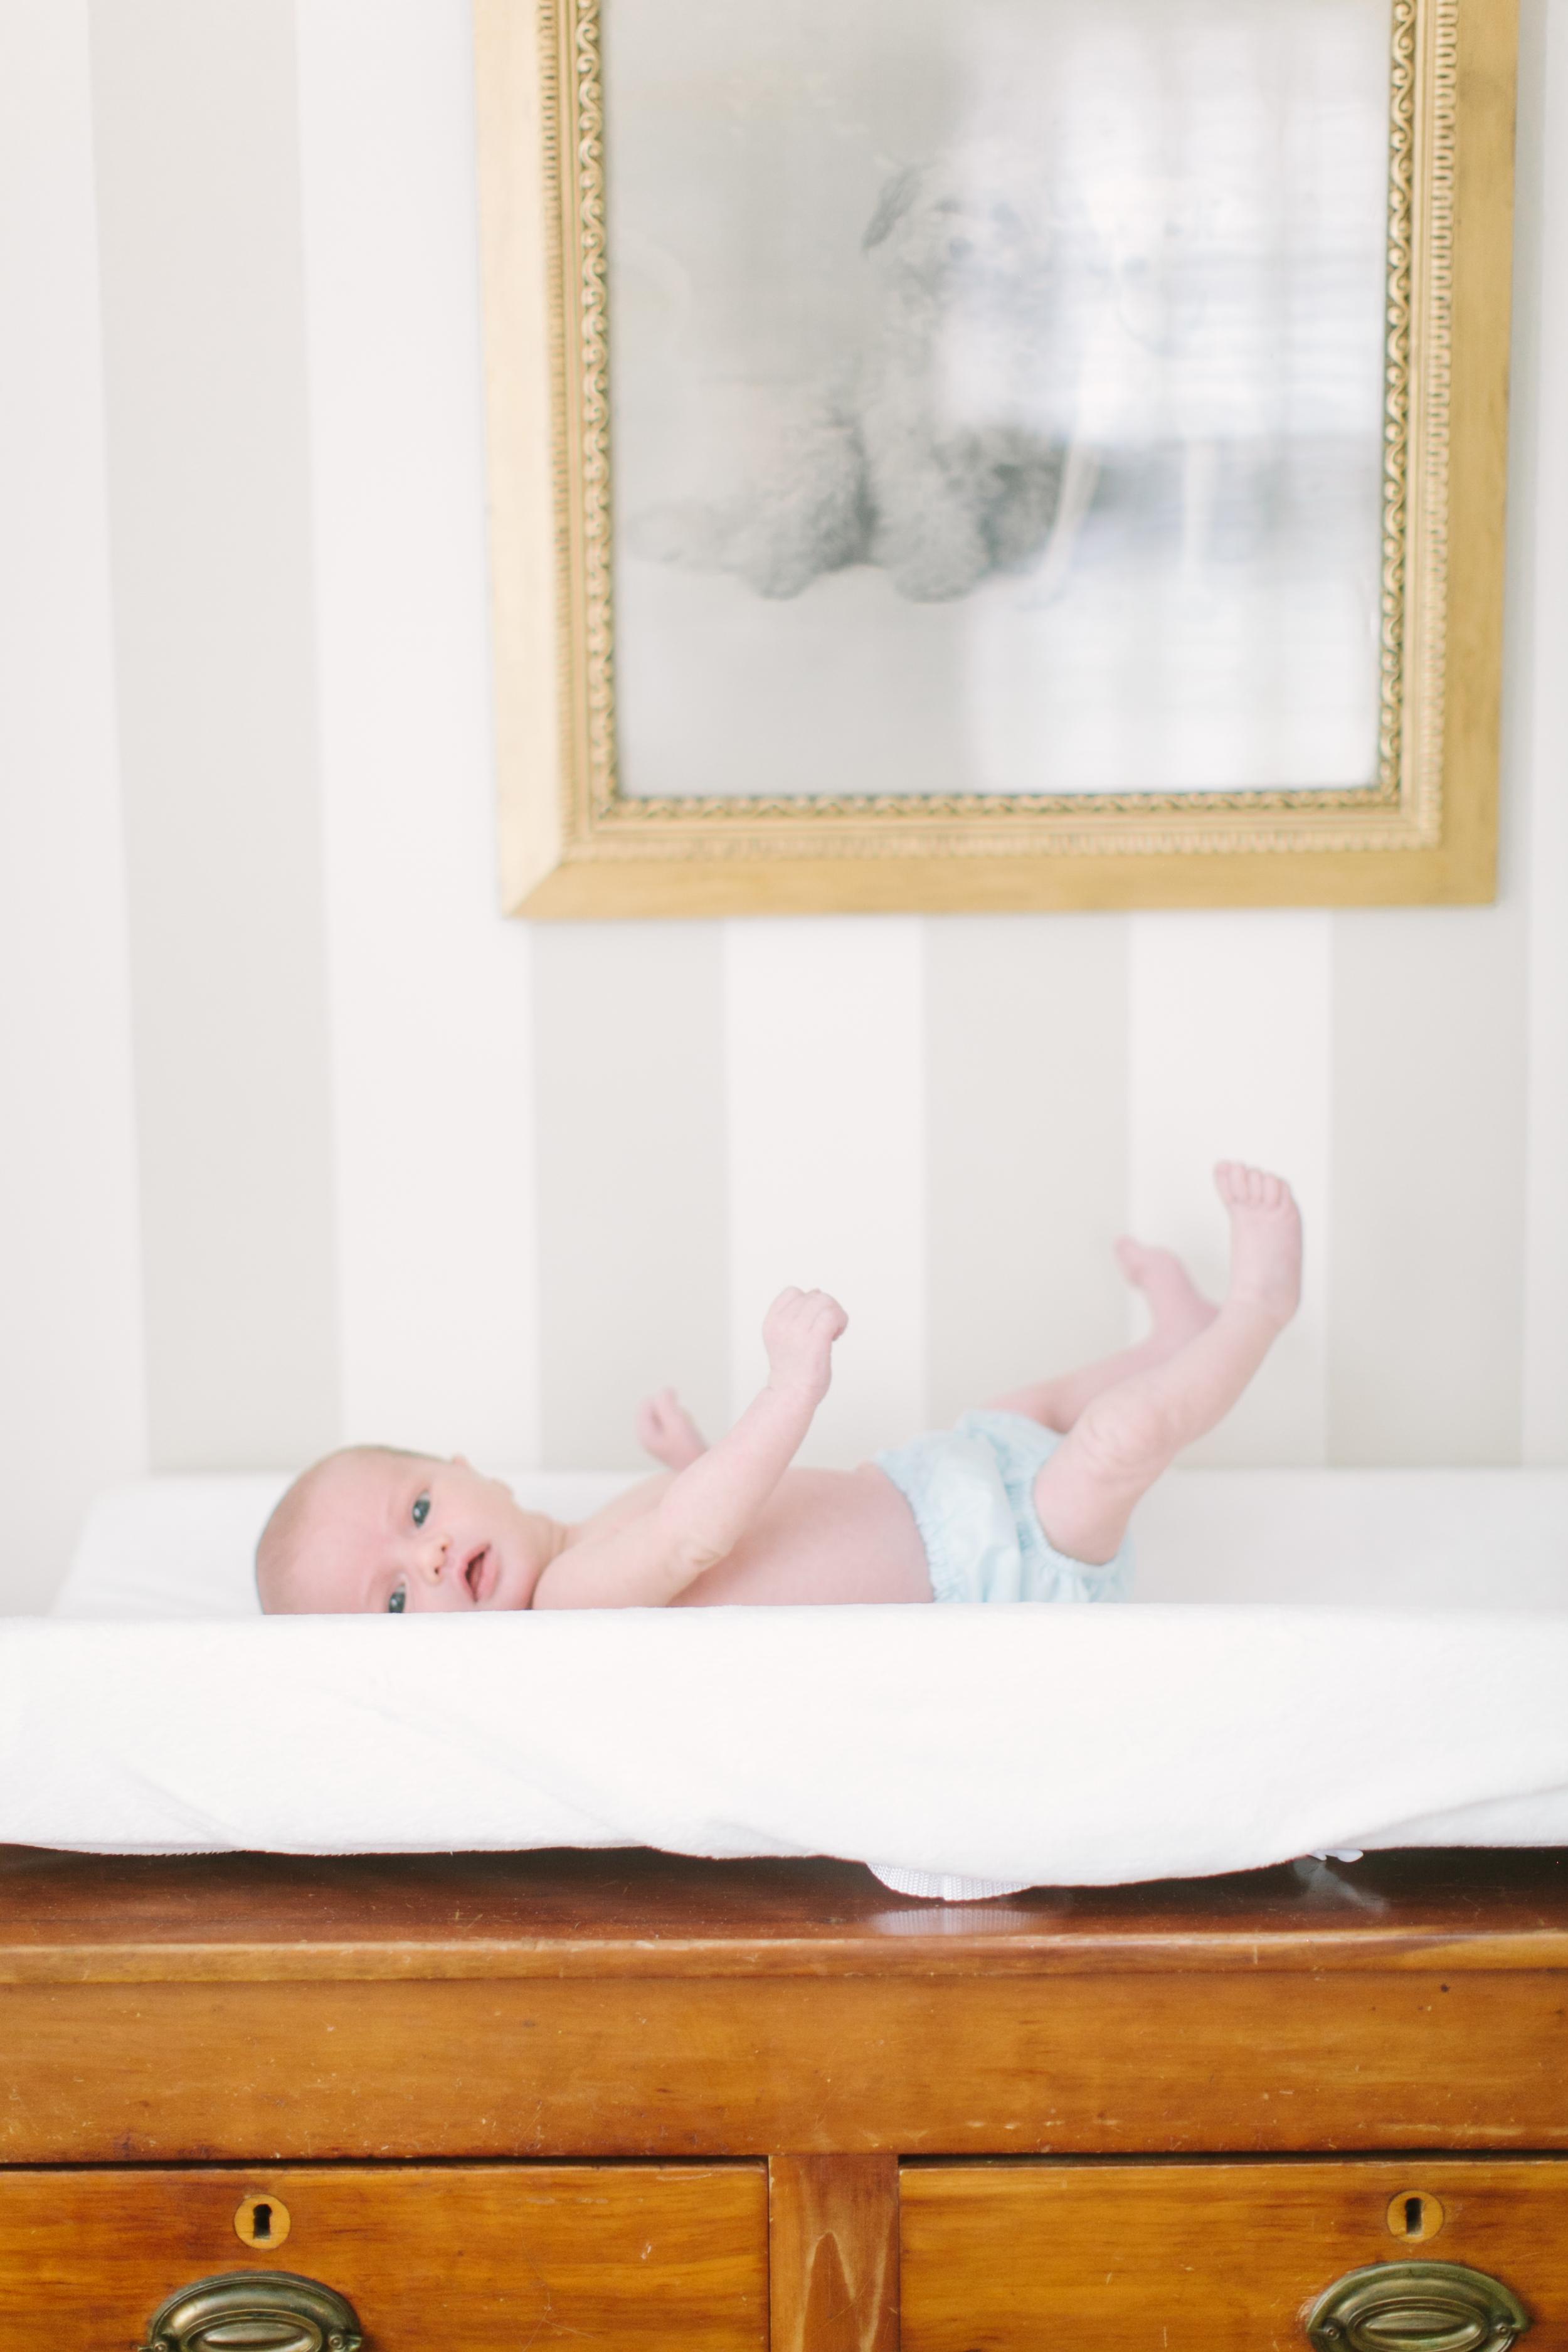 Kathryn-McCrary-Photography-Atlanta-Newborn-Photographer-Alex-158.jpg